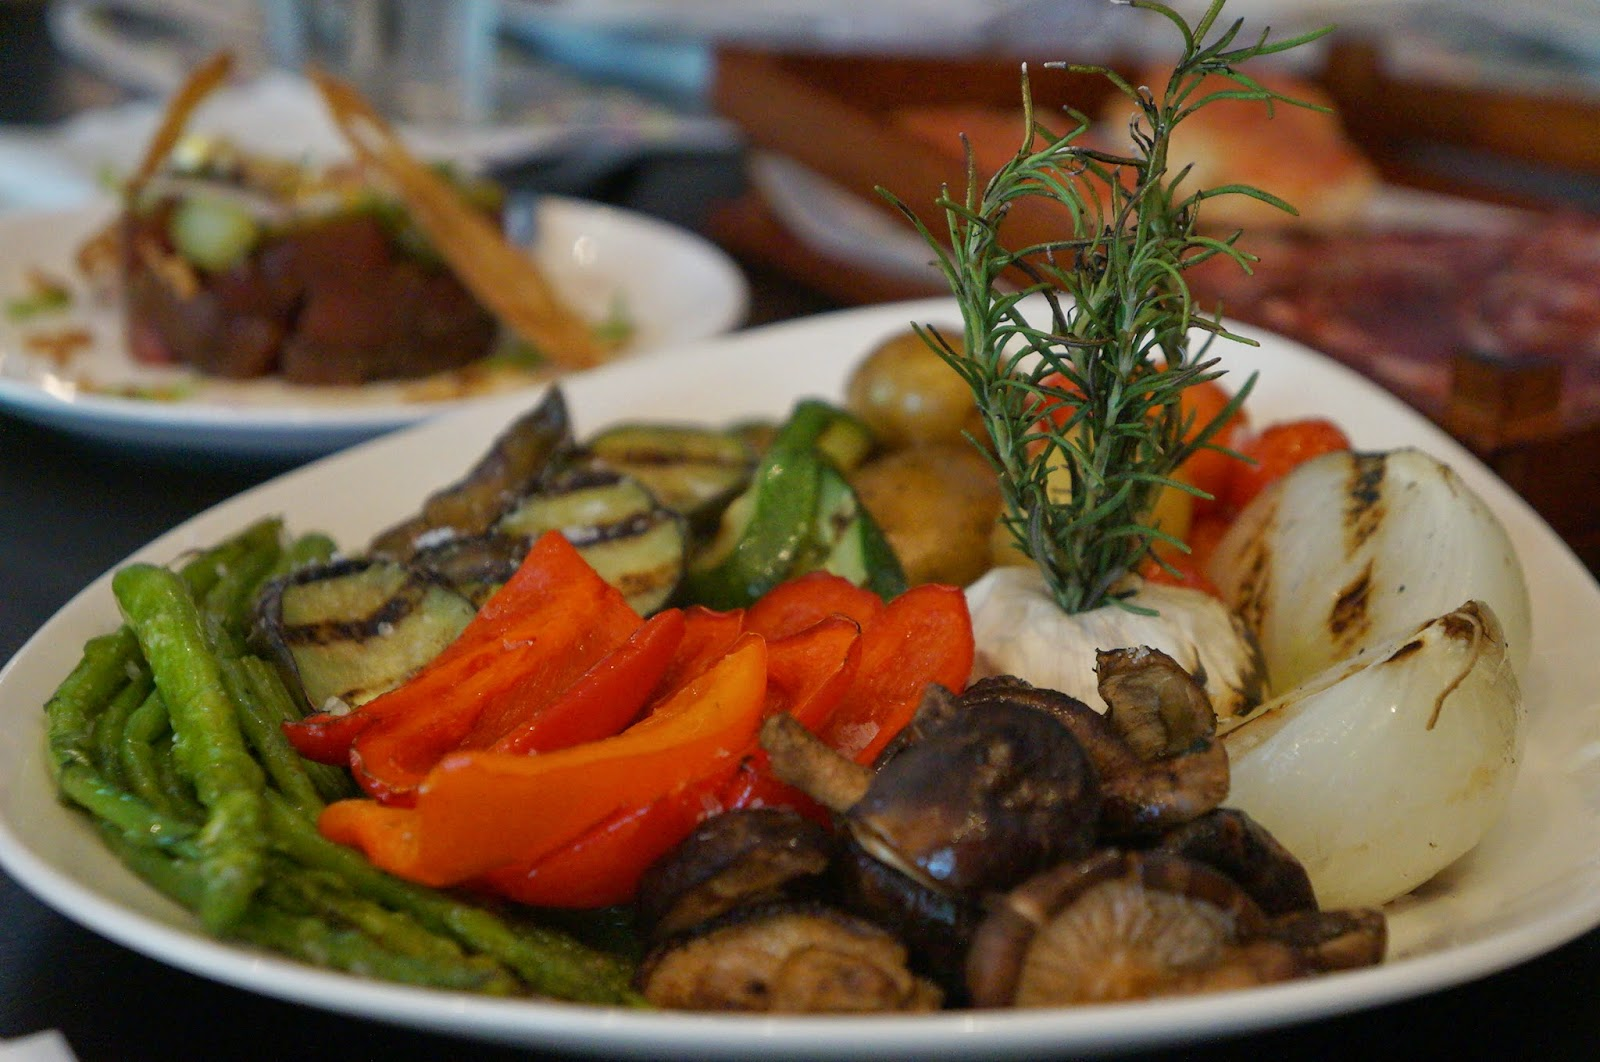 Las flores levels up their menu to a more sumptuous for Parrillada verduras